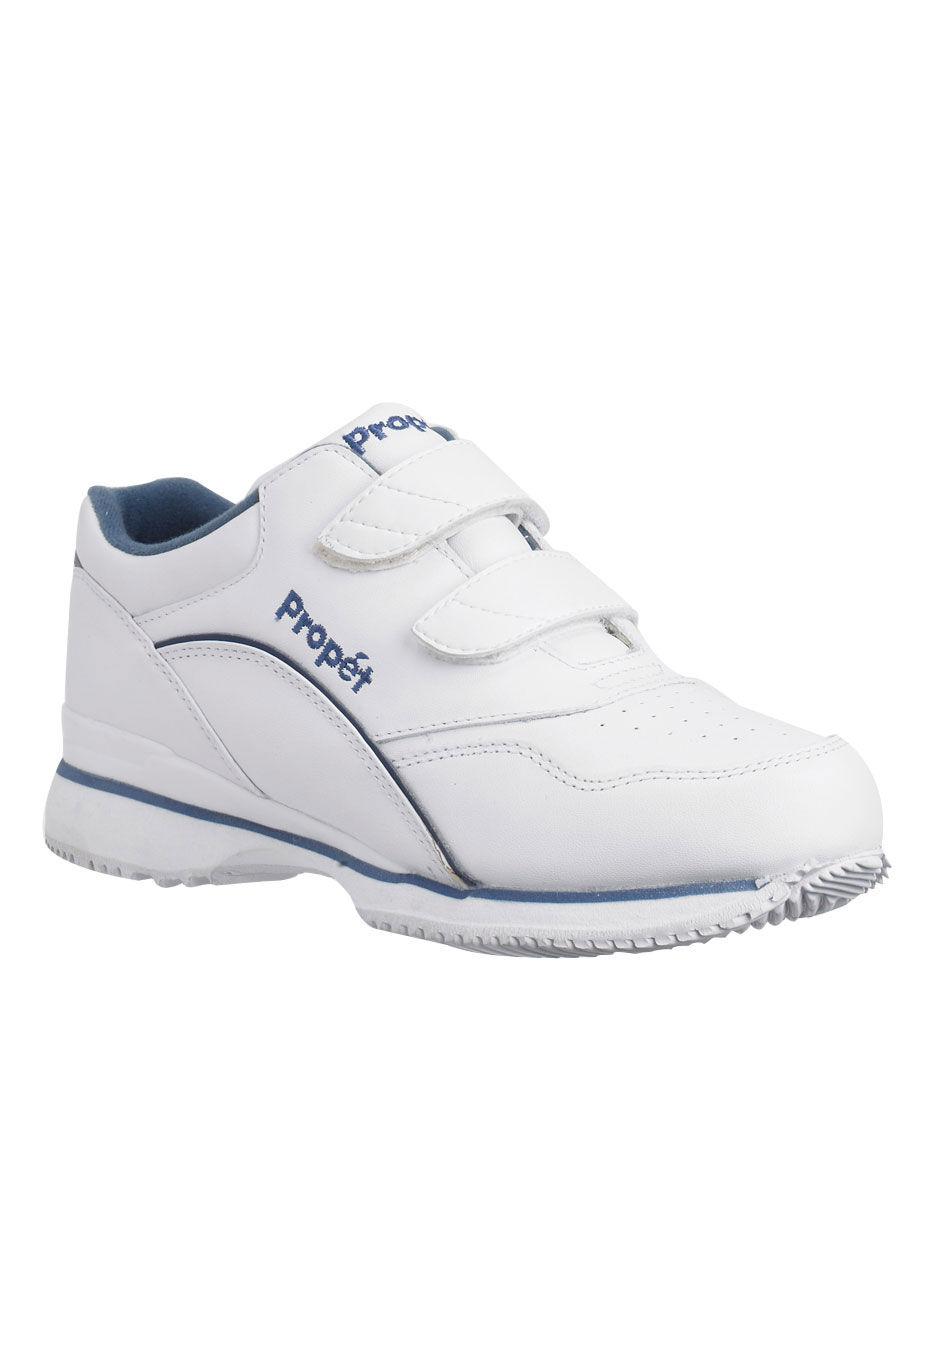 Shoes, Sandals \u0026 Boots by Propet